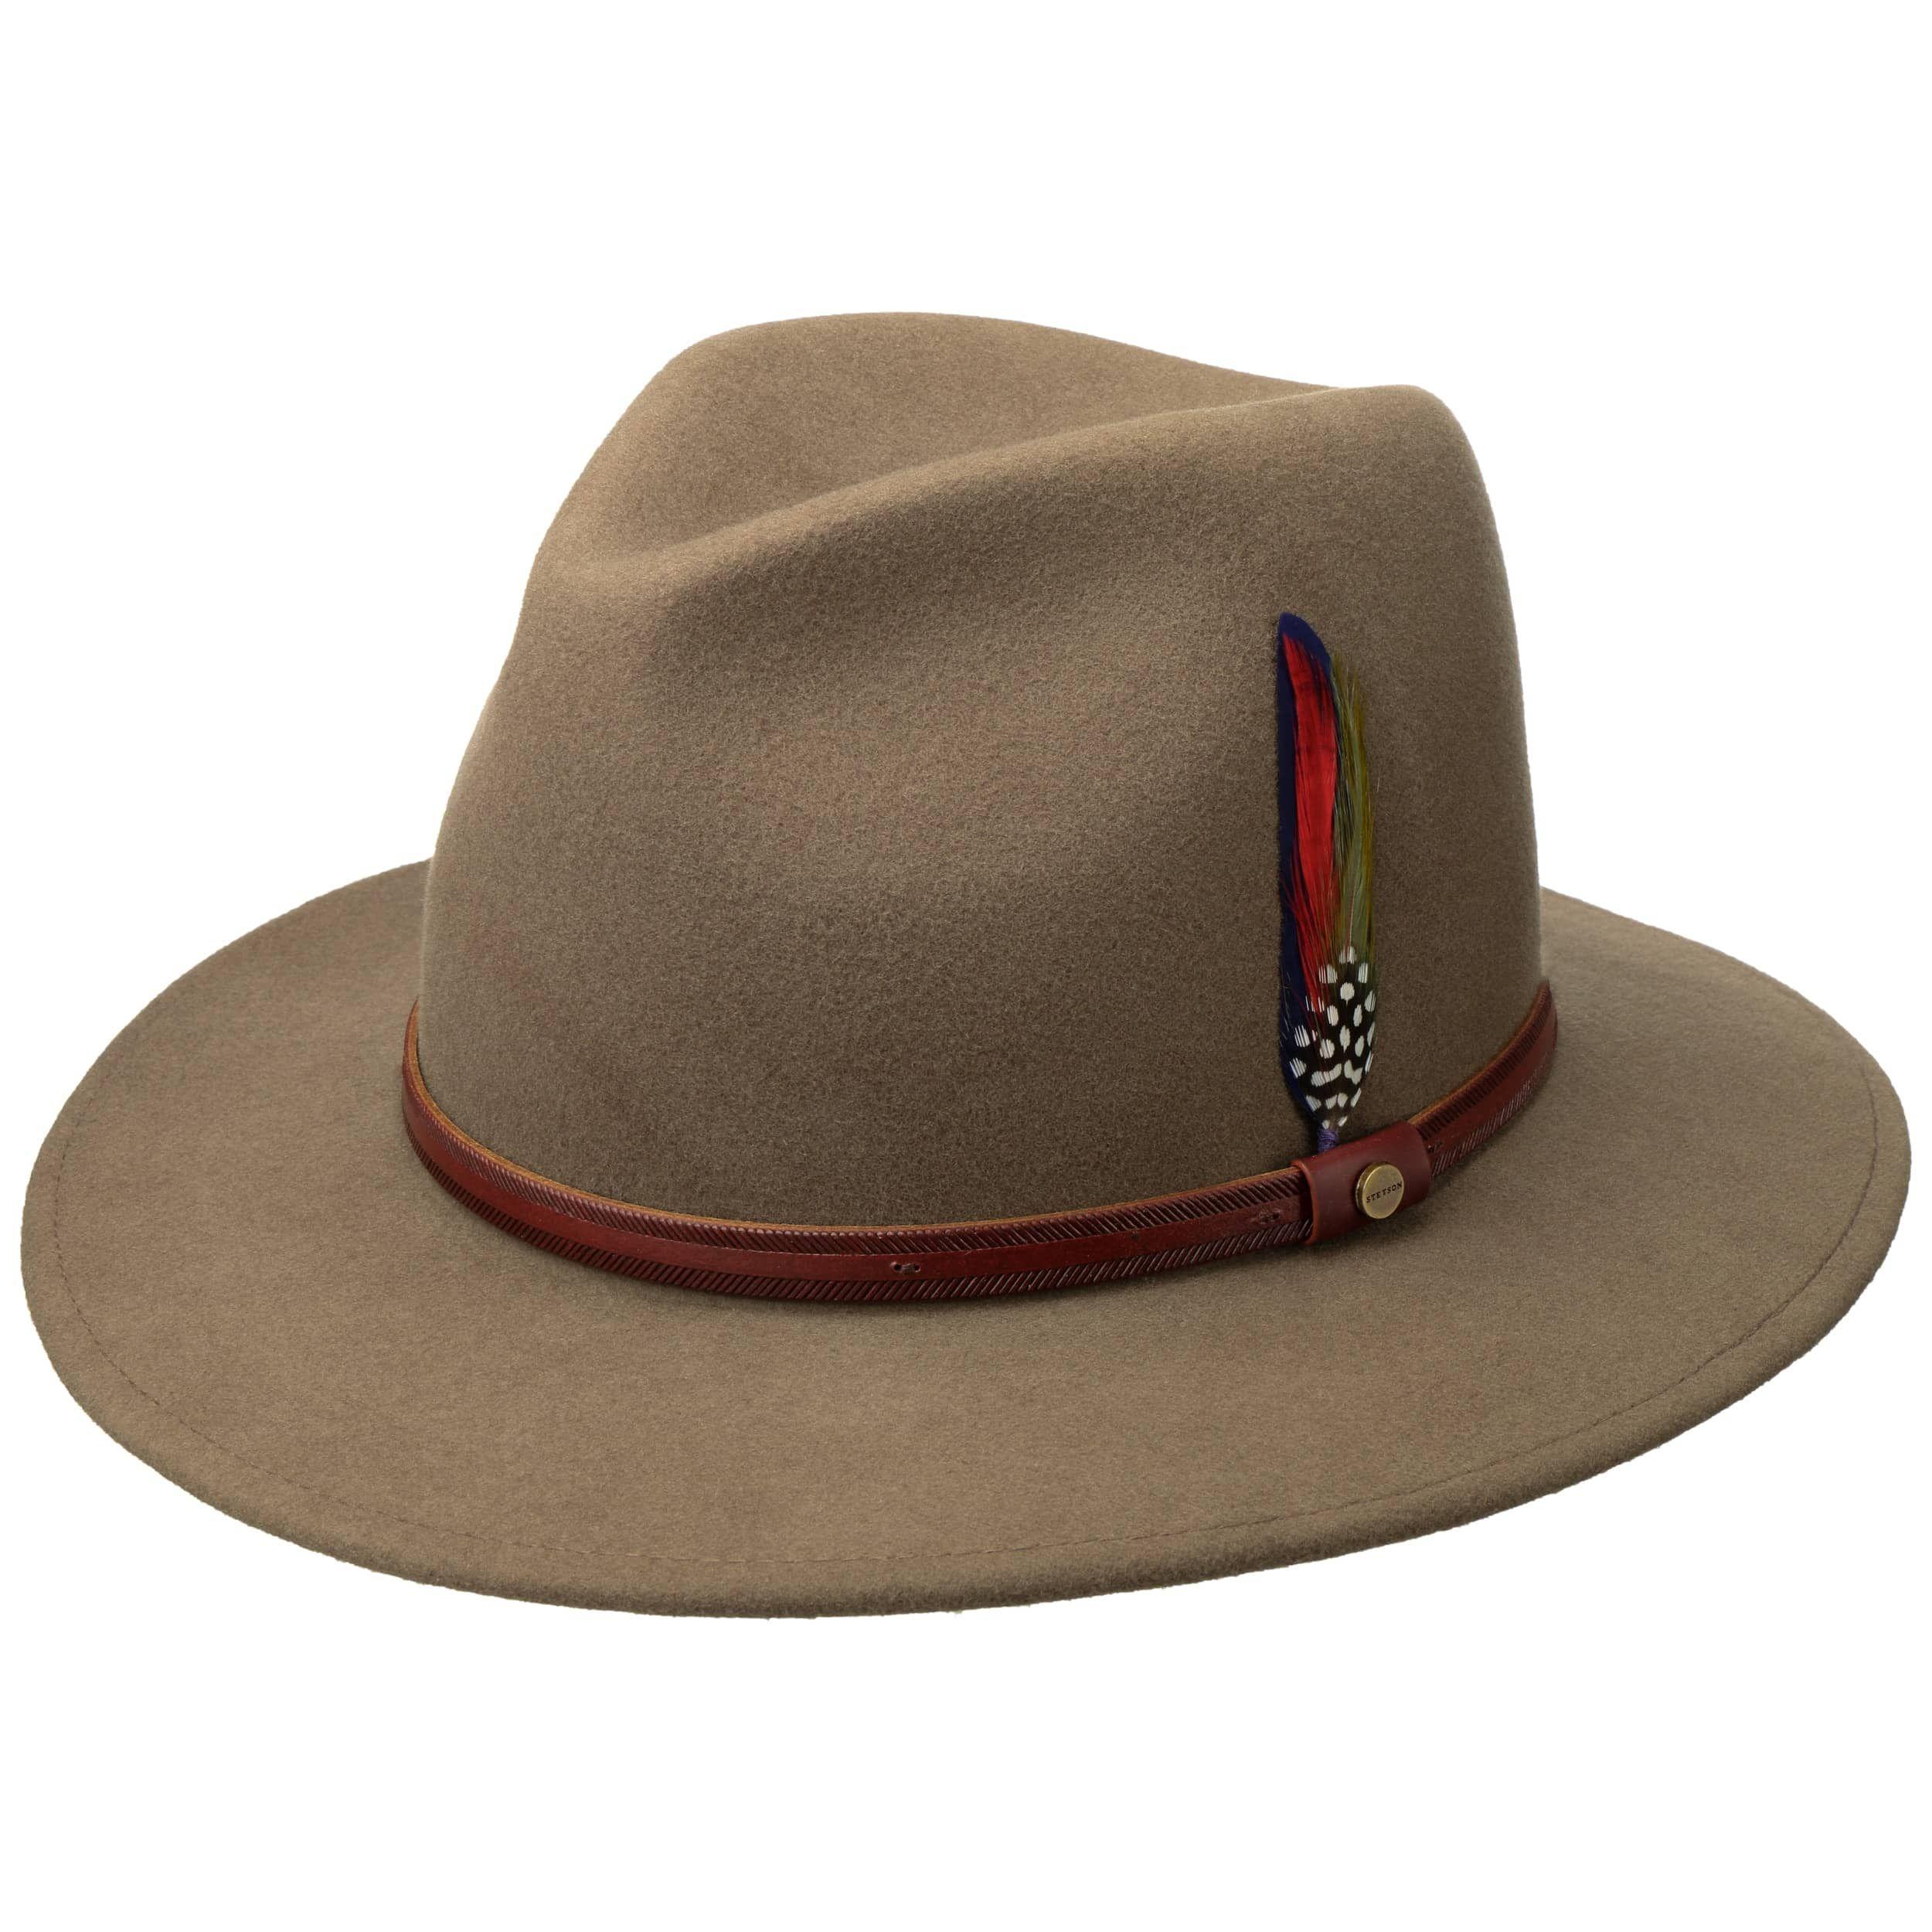 Stetson Rantoul Wool Felt Fedora Hat Small to XXL